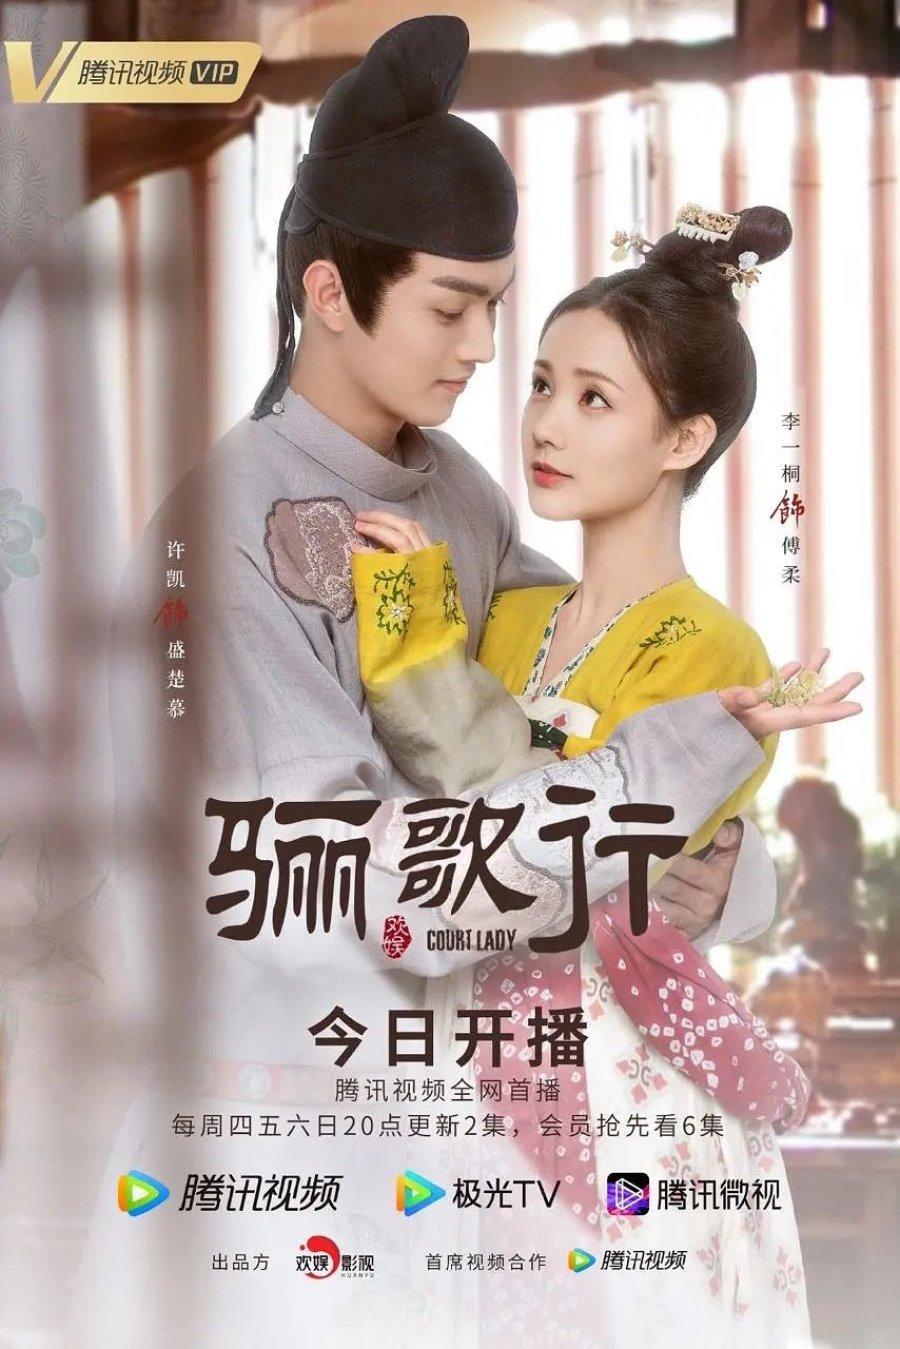 court-lady-ลำนำรักแห่งฉางอัน-ซับไทย-ep-1-55